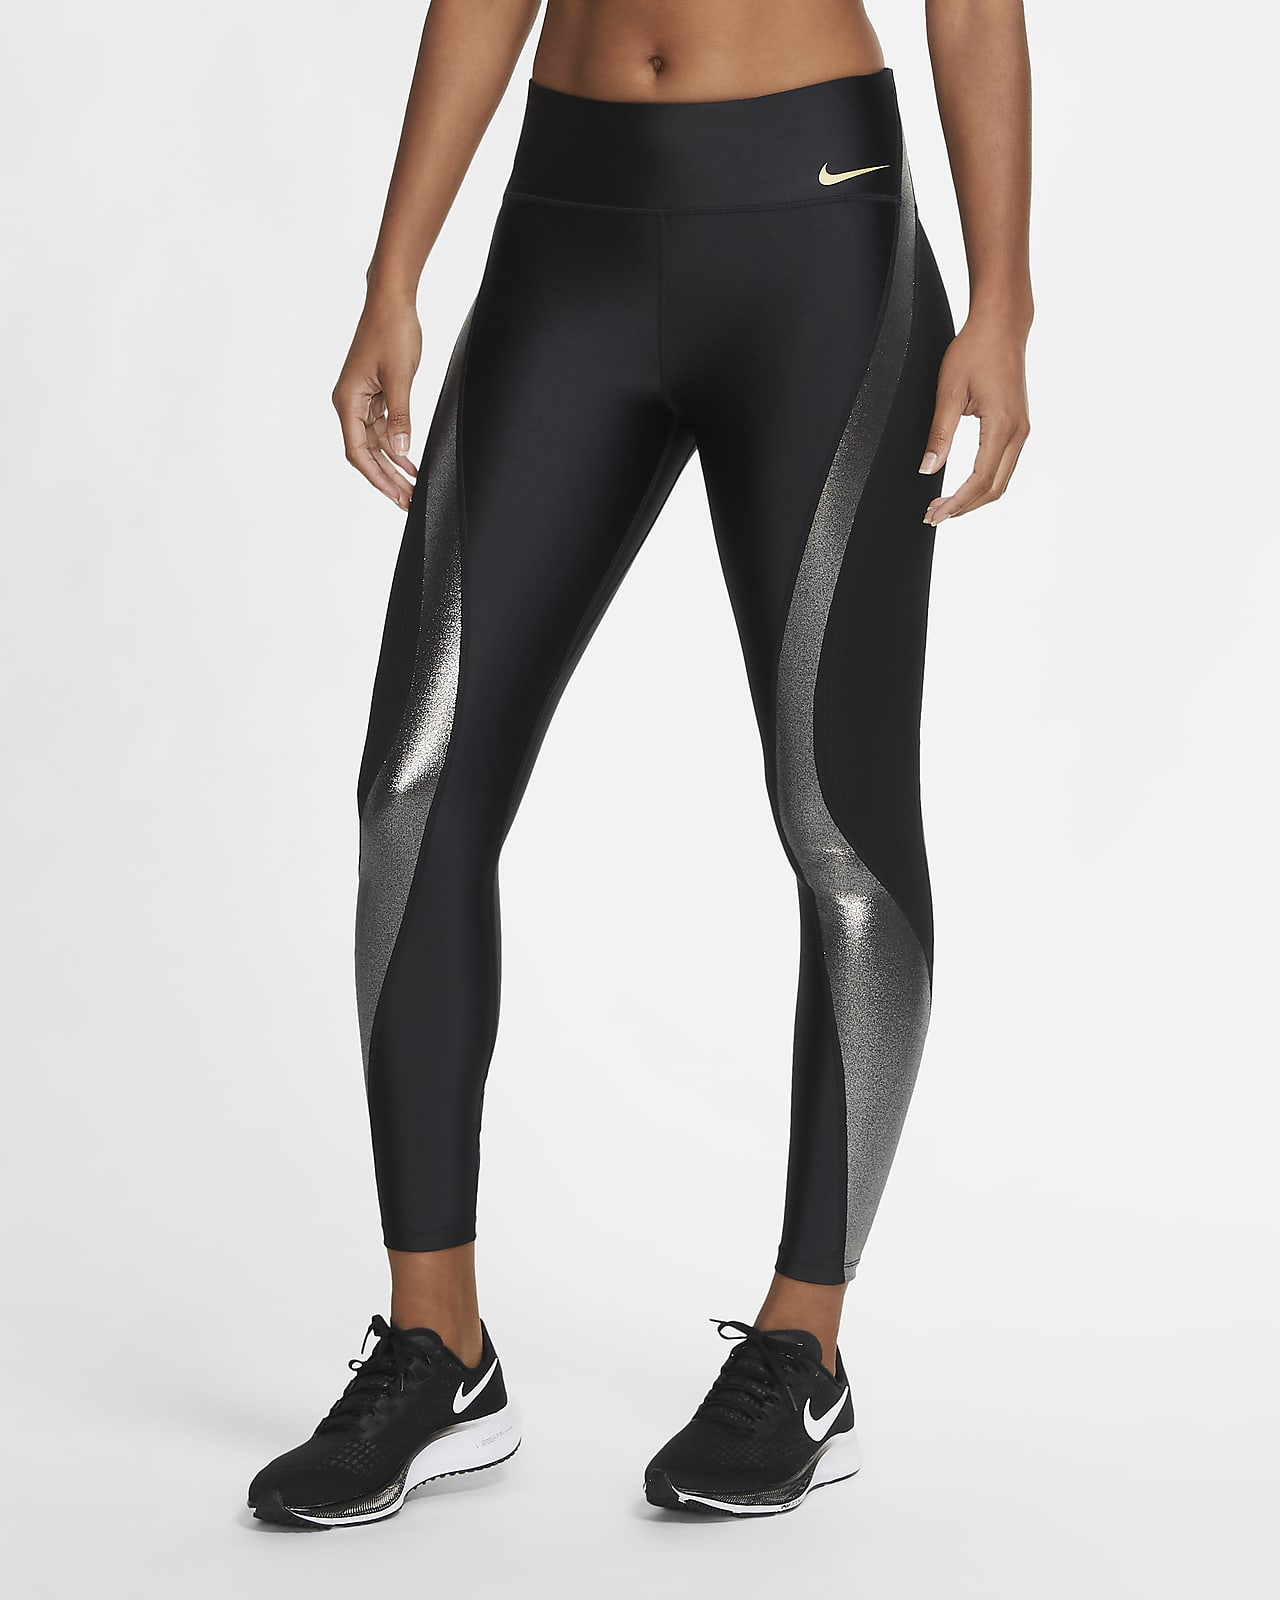 Nike Icon Clash Speed Women's 7/8 Running Leggings